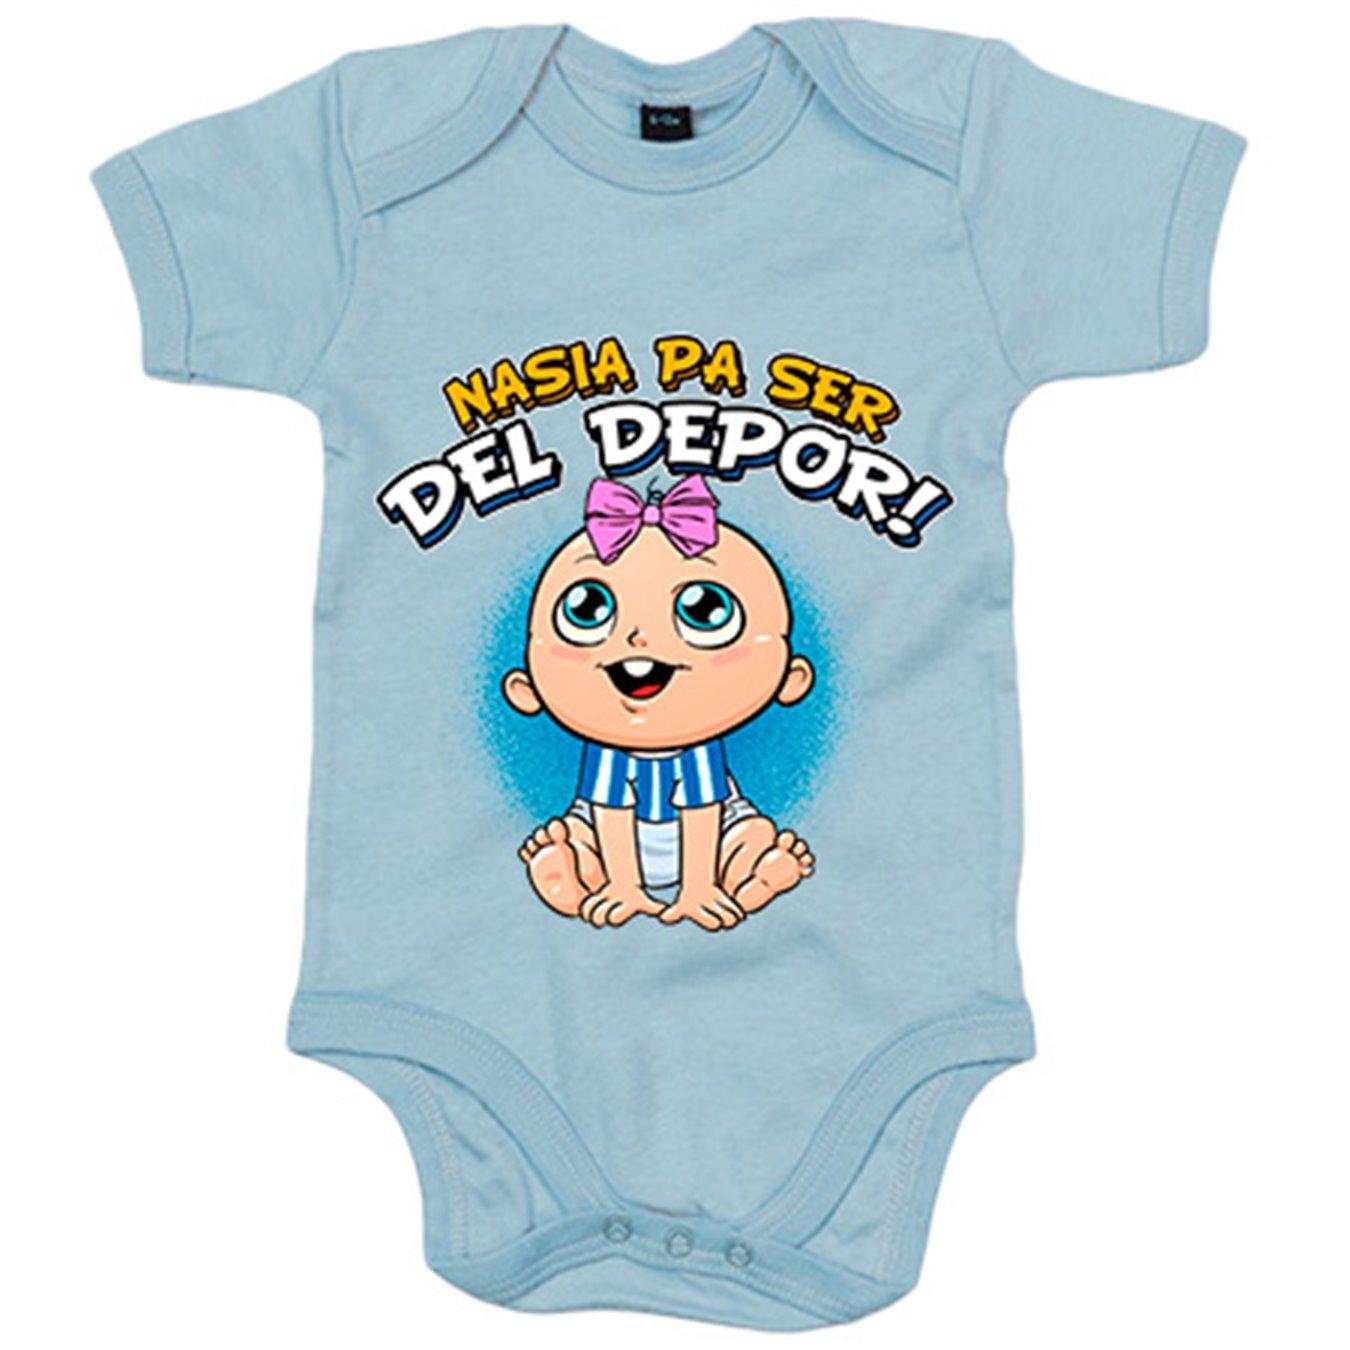 Body bebé nacida para ser del Depor Coruña fútbol - Azul ...